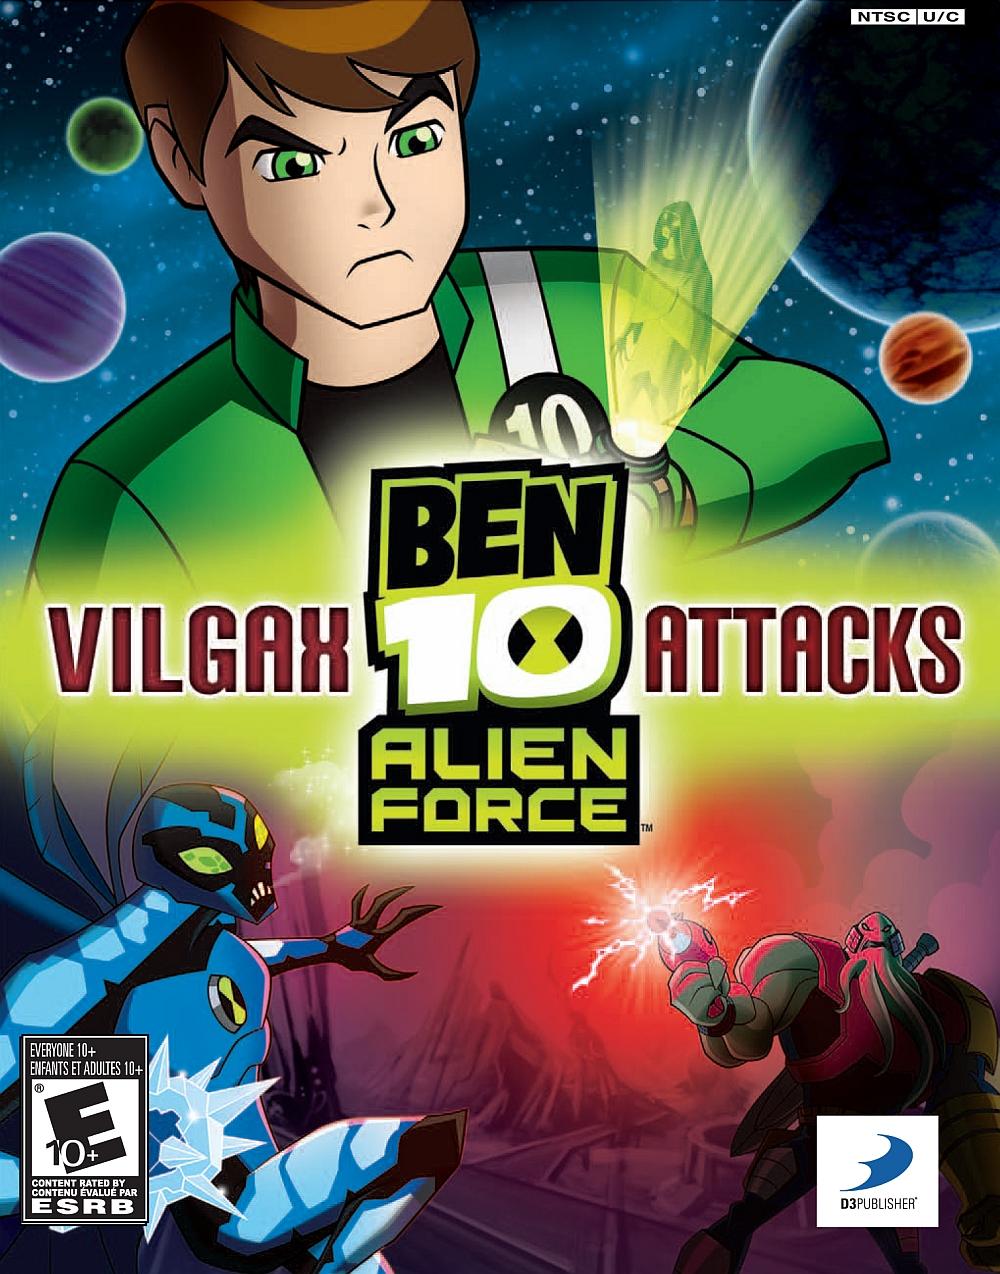 Ben 10 Alien Force: Vilgax Attacks | Ben 10 Wiki | FANDOM